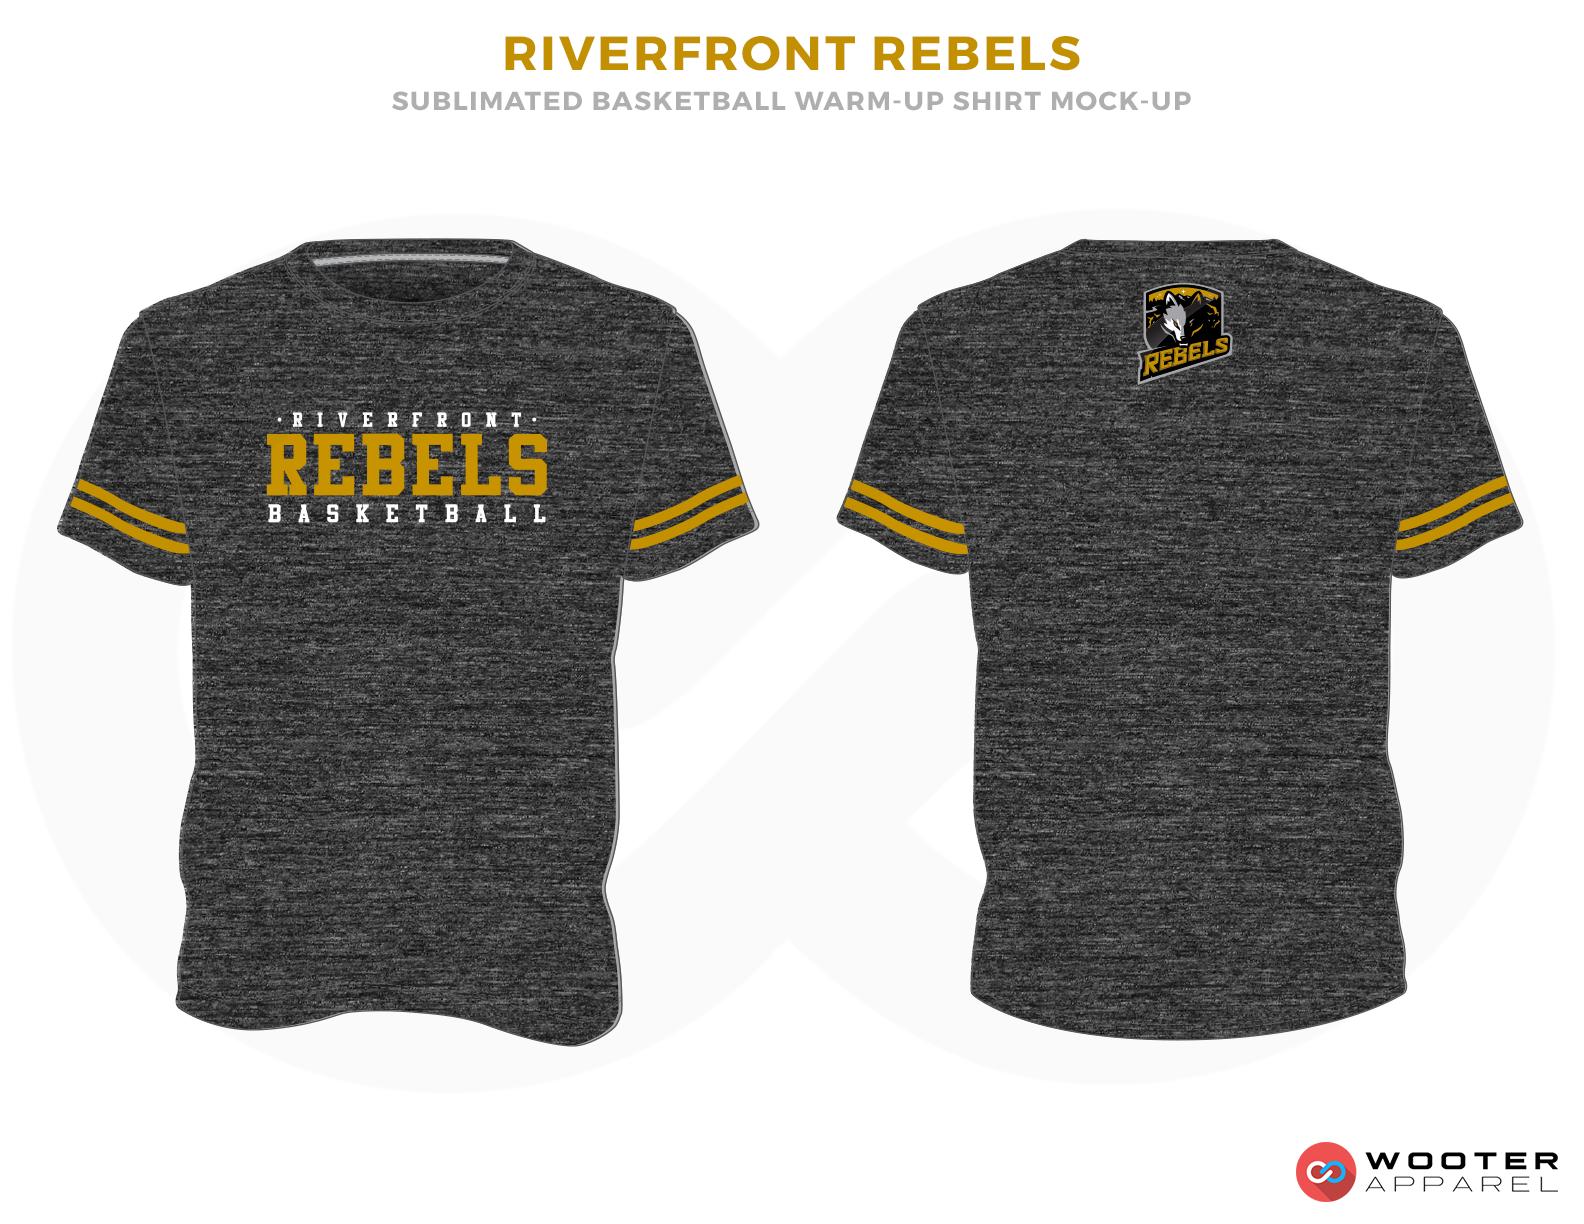 RIVERFRONT REBLES Black White and Yellow Basketball Uniforms, Jersey